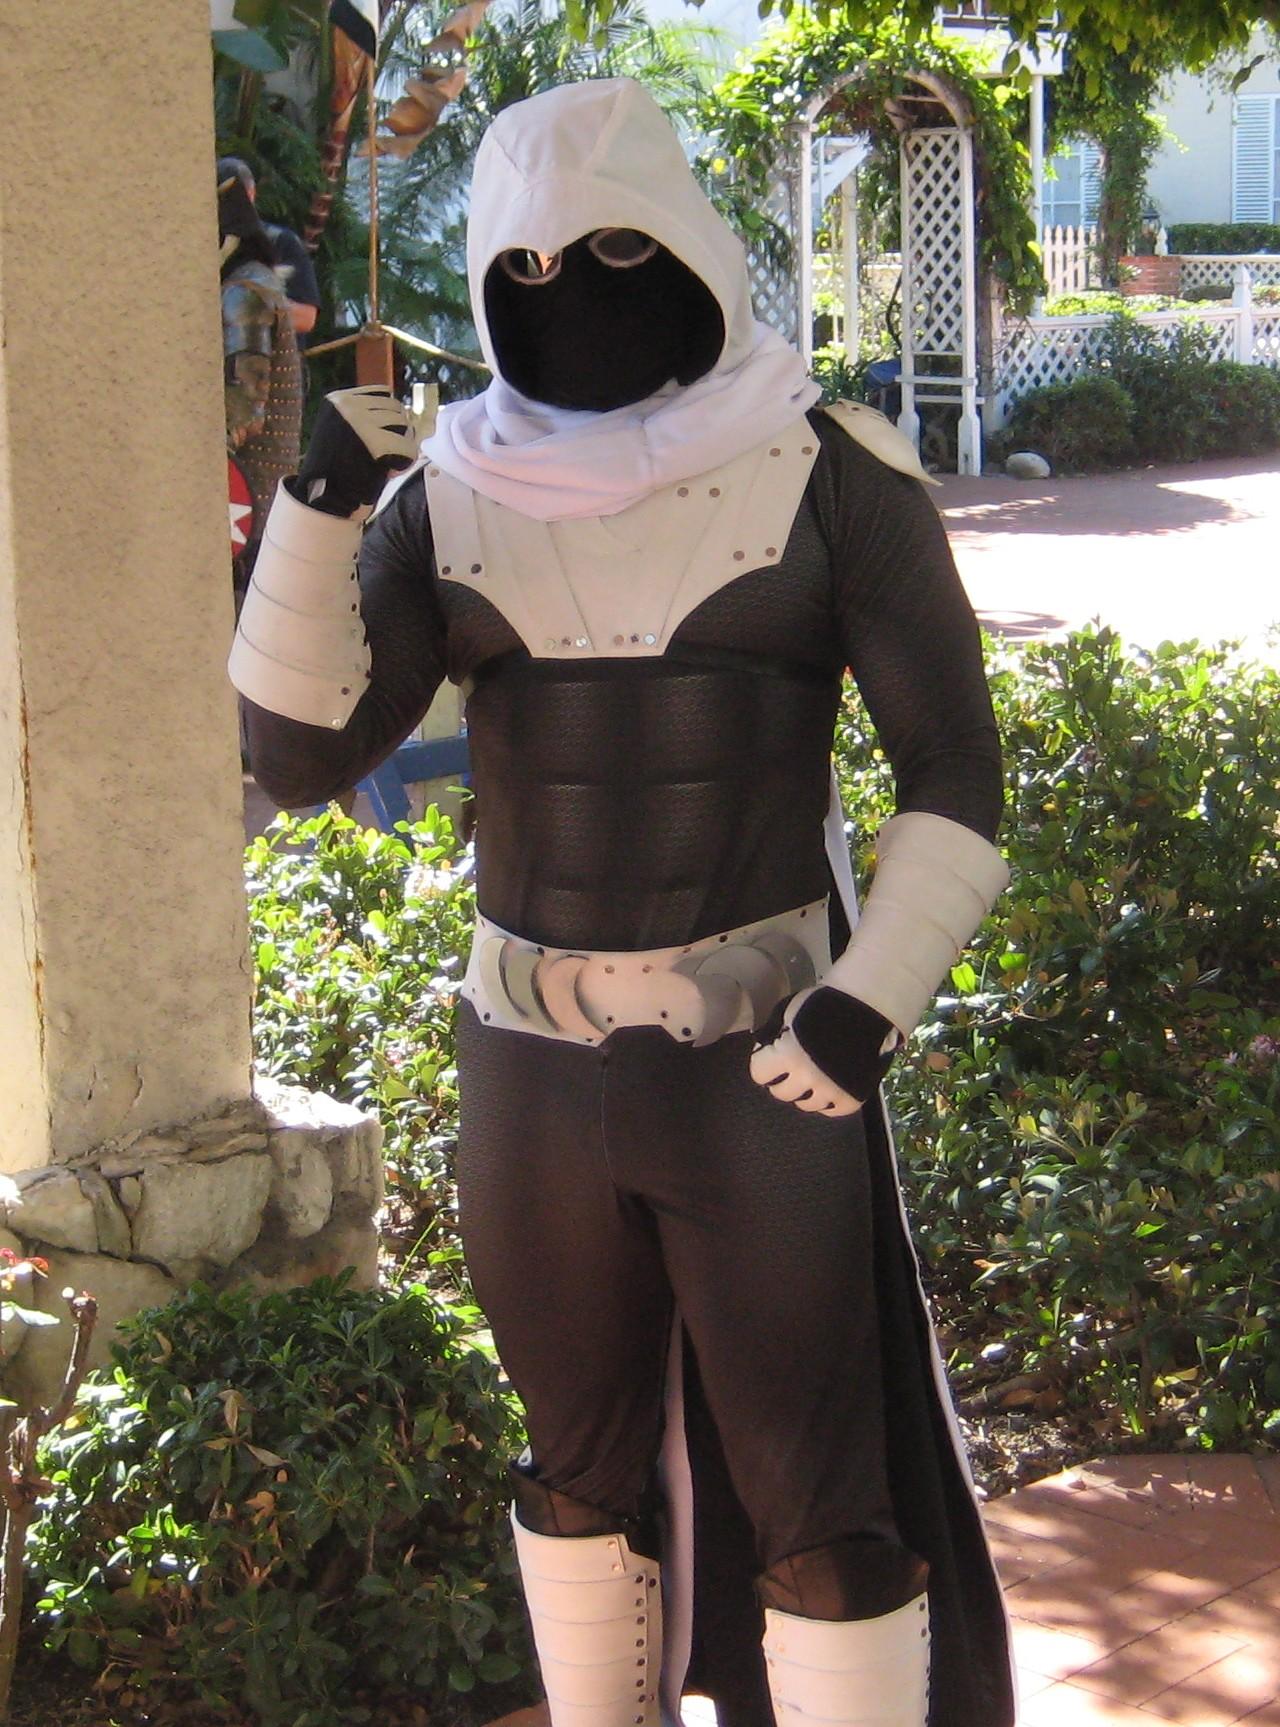 Moon Knight from MarvelComics